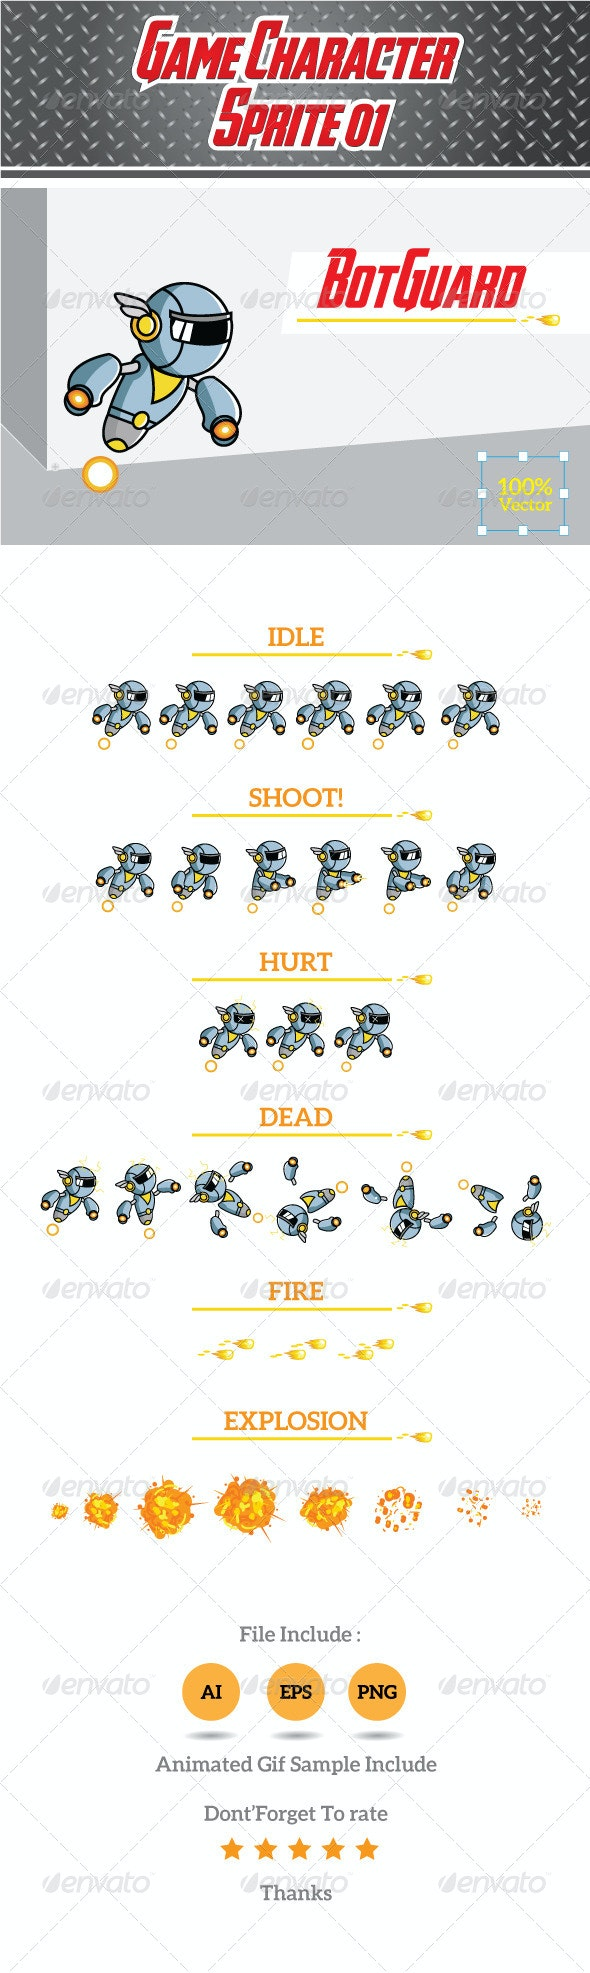 Game Character Sprite 01- BotGuard - Sprites Game Assets